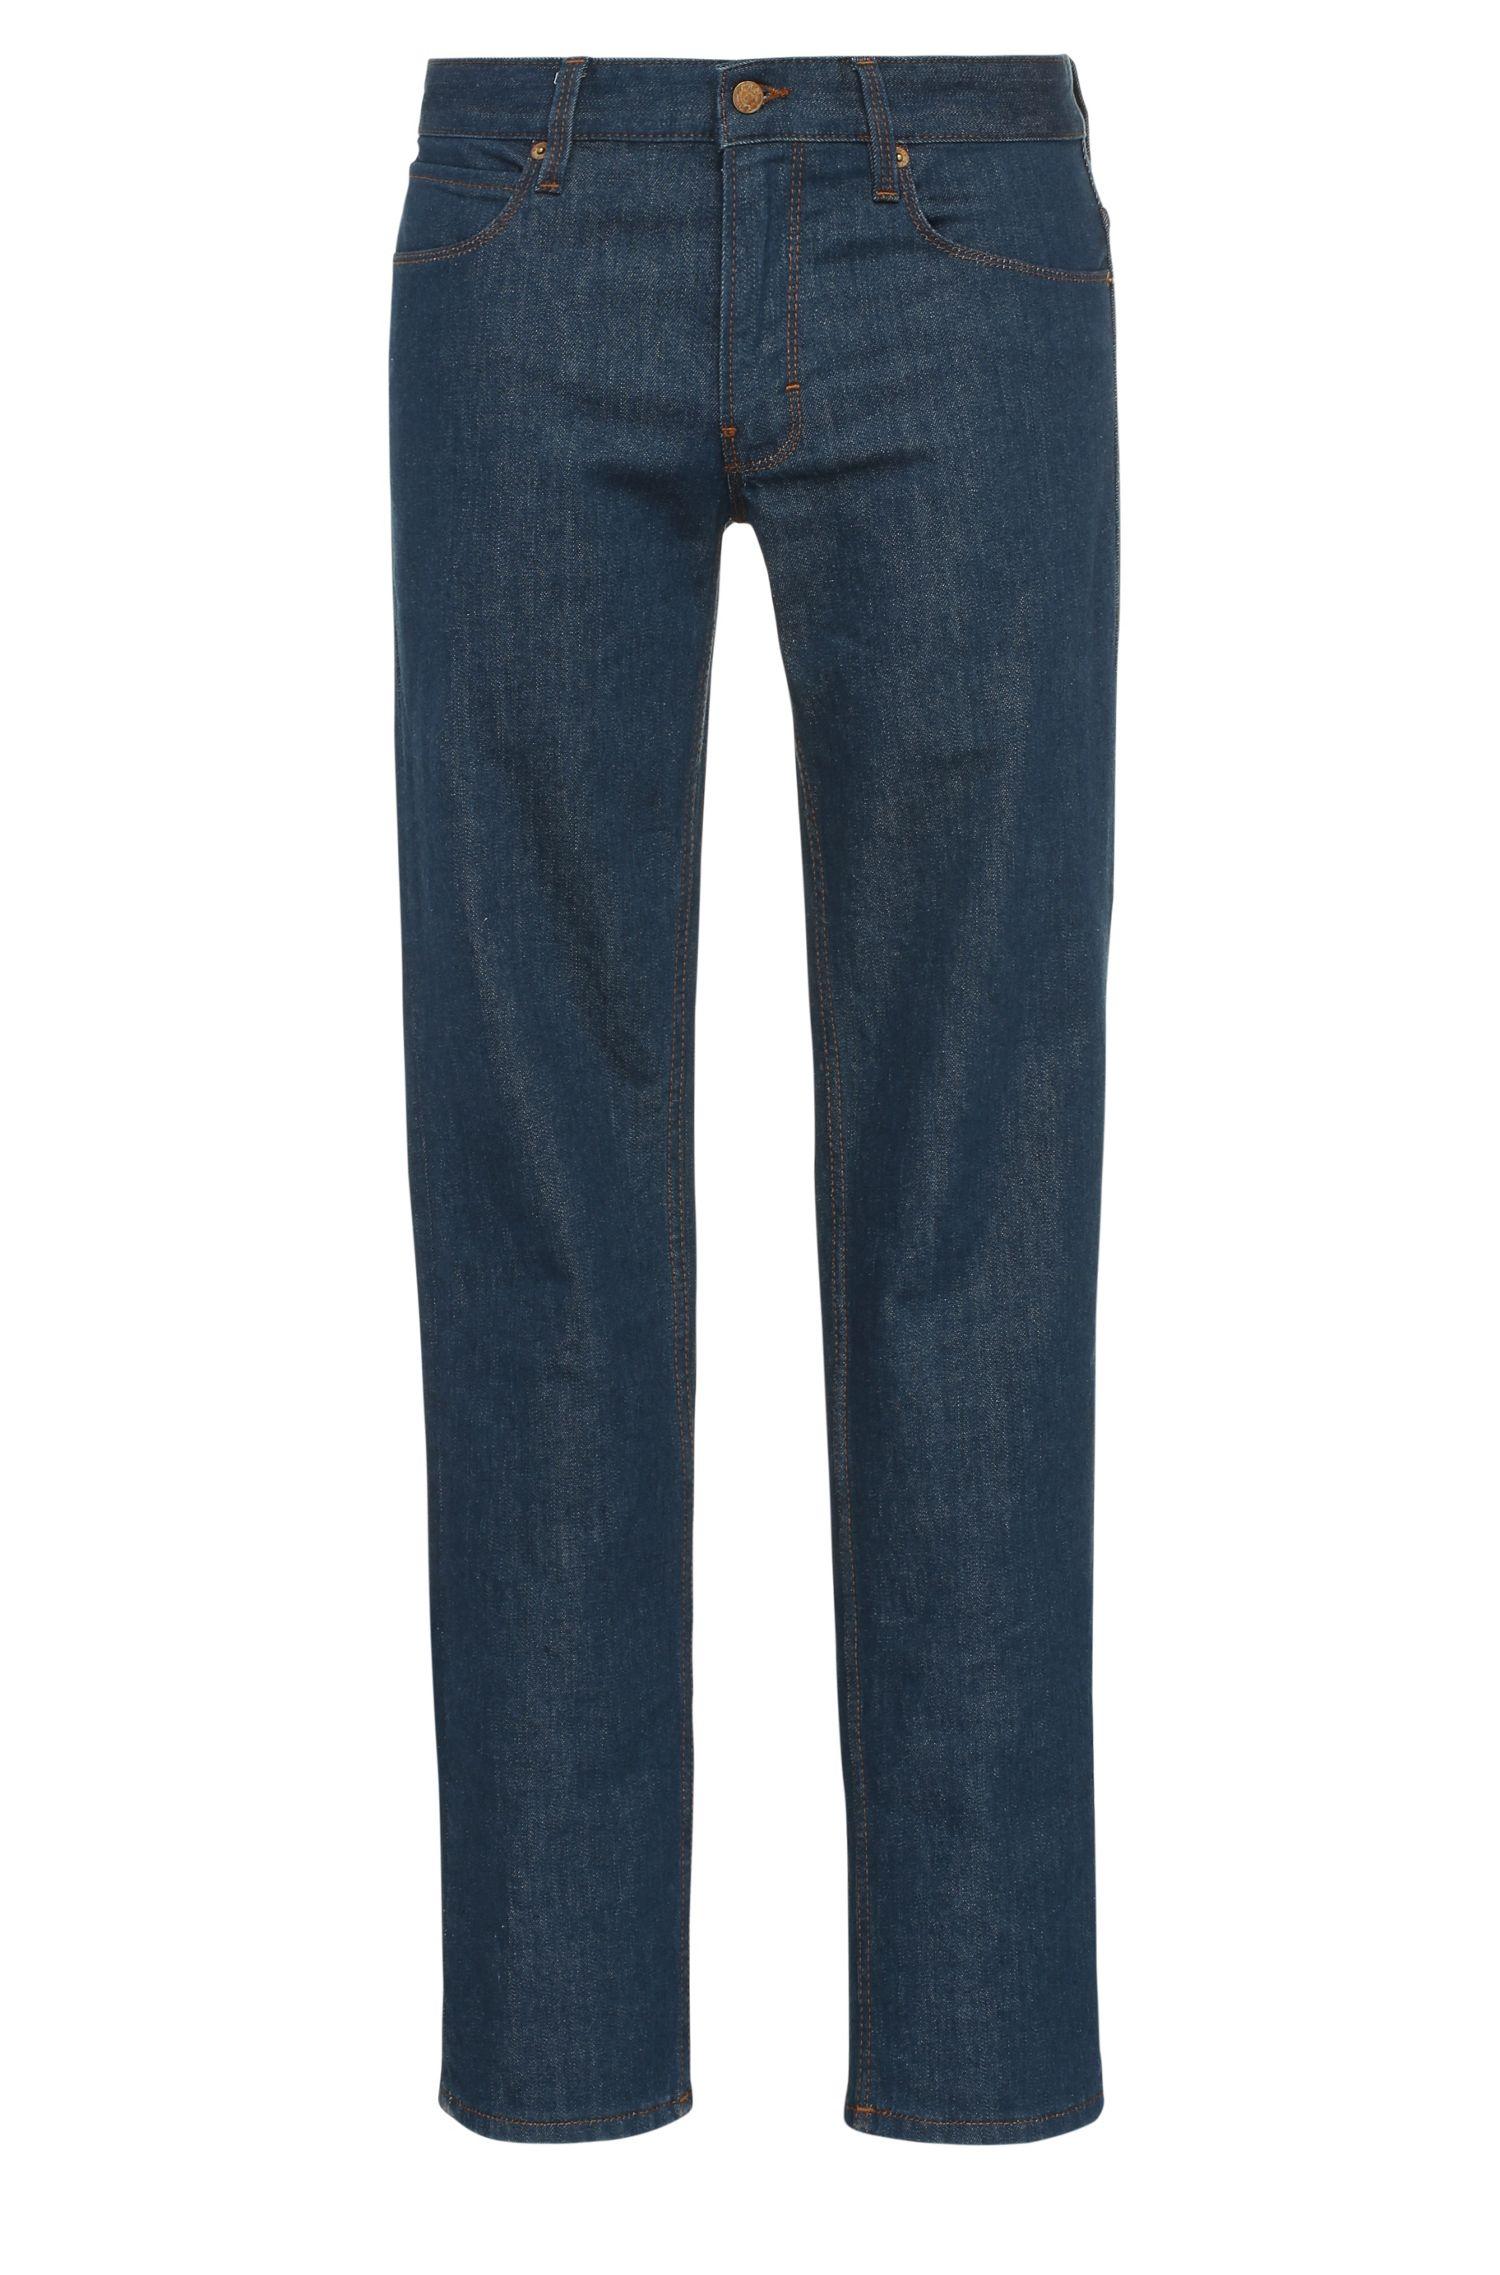 'Orange63'   Slim Fit, 11 oz Stretch Cotton Jeans